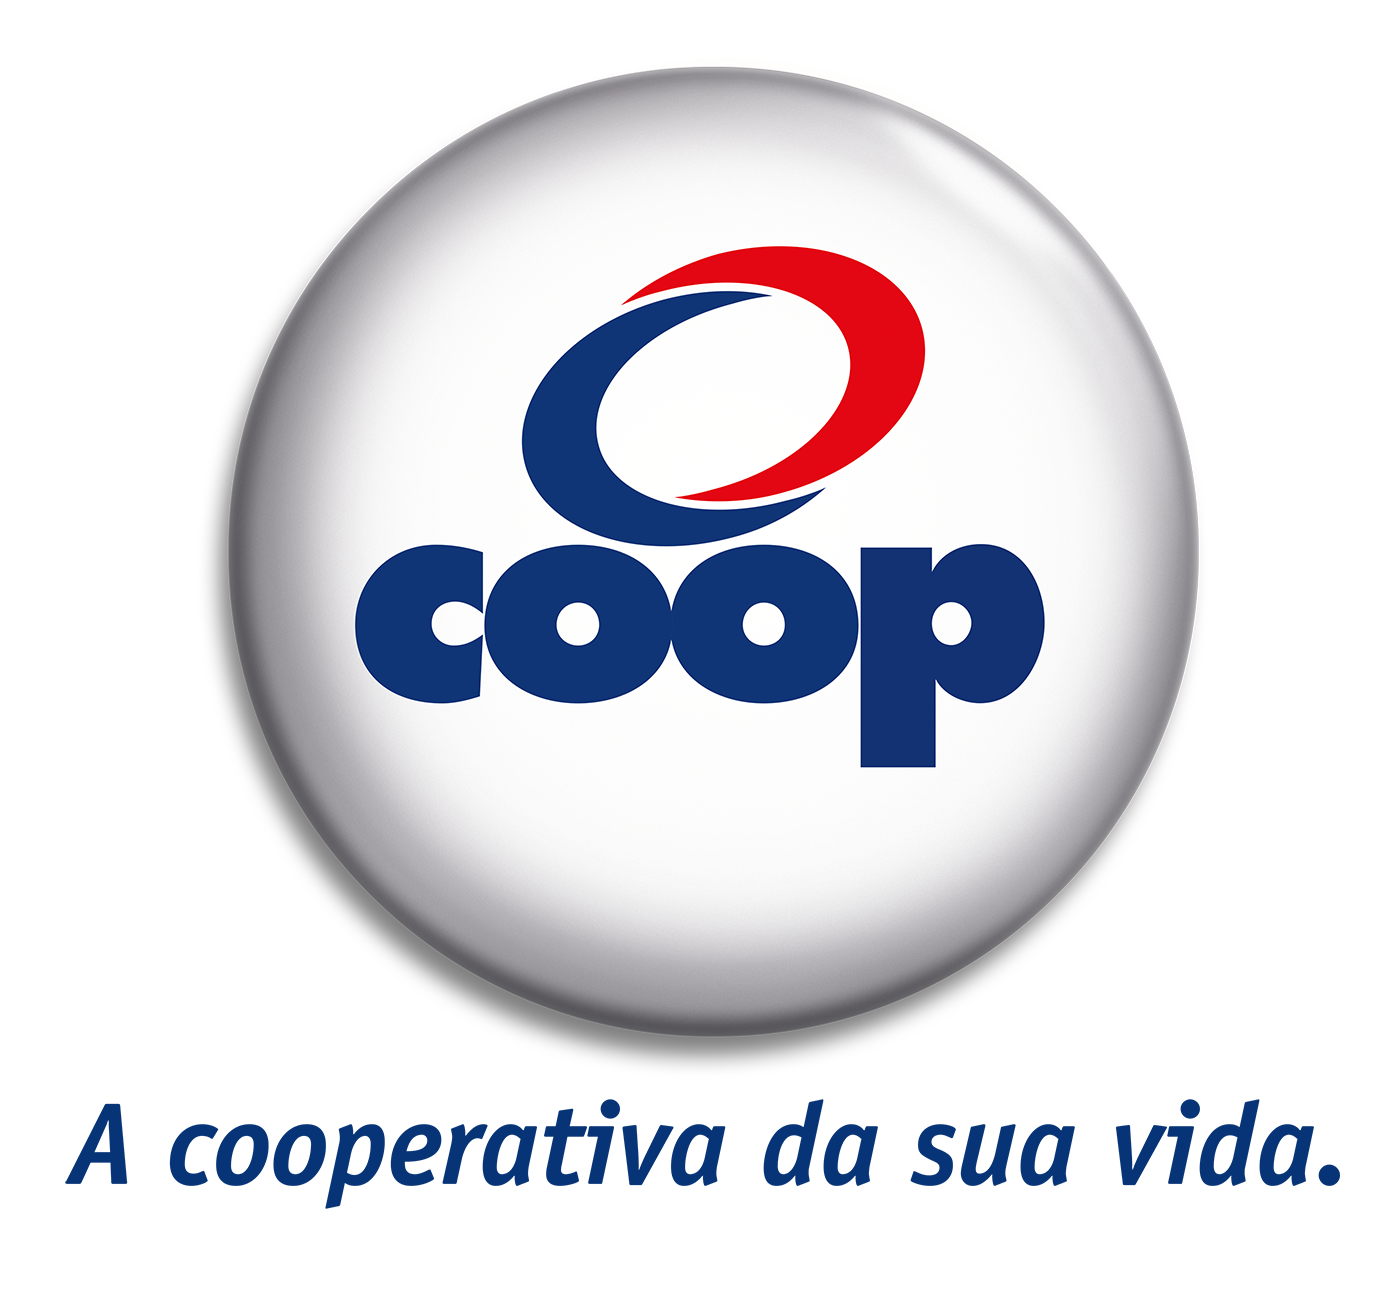 Logotipo da Coop